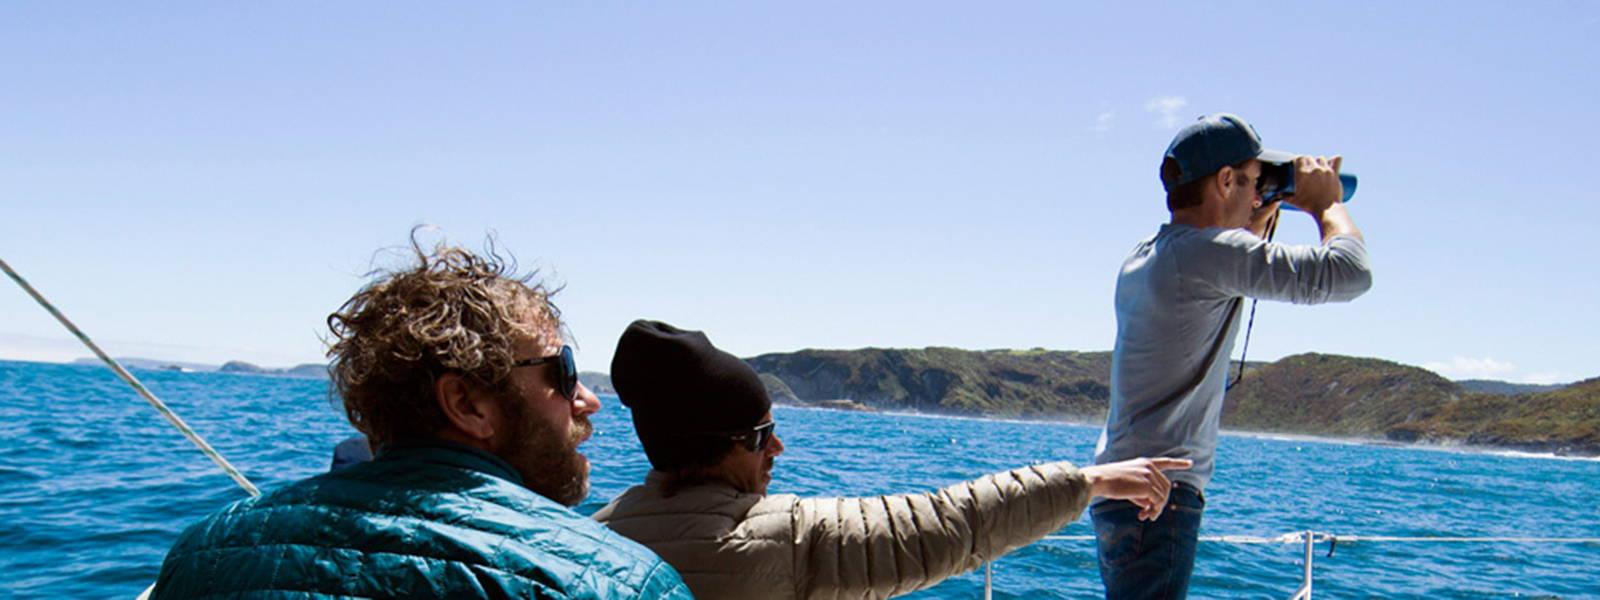 Patagonia models at sea